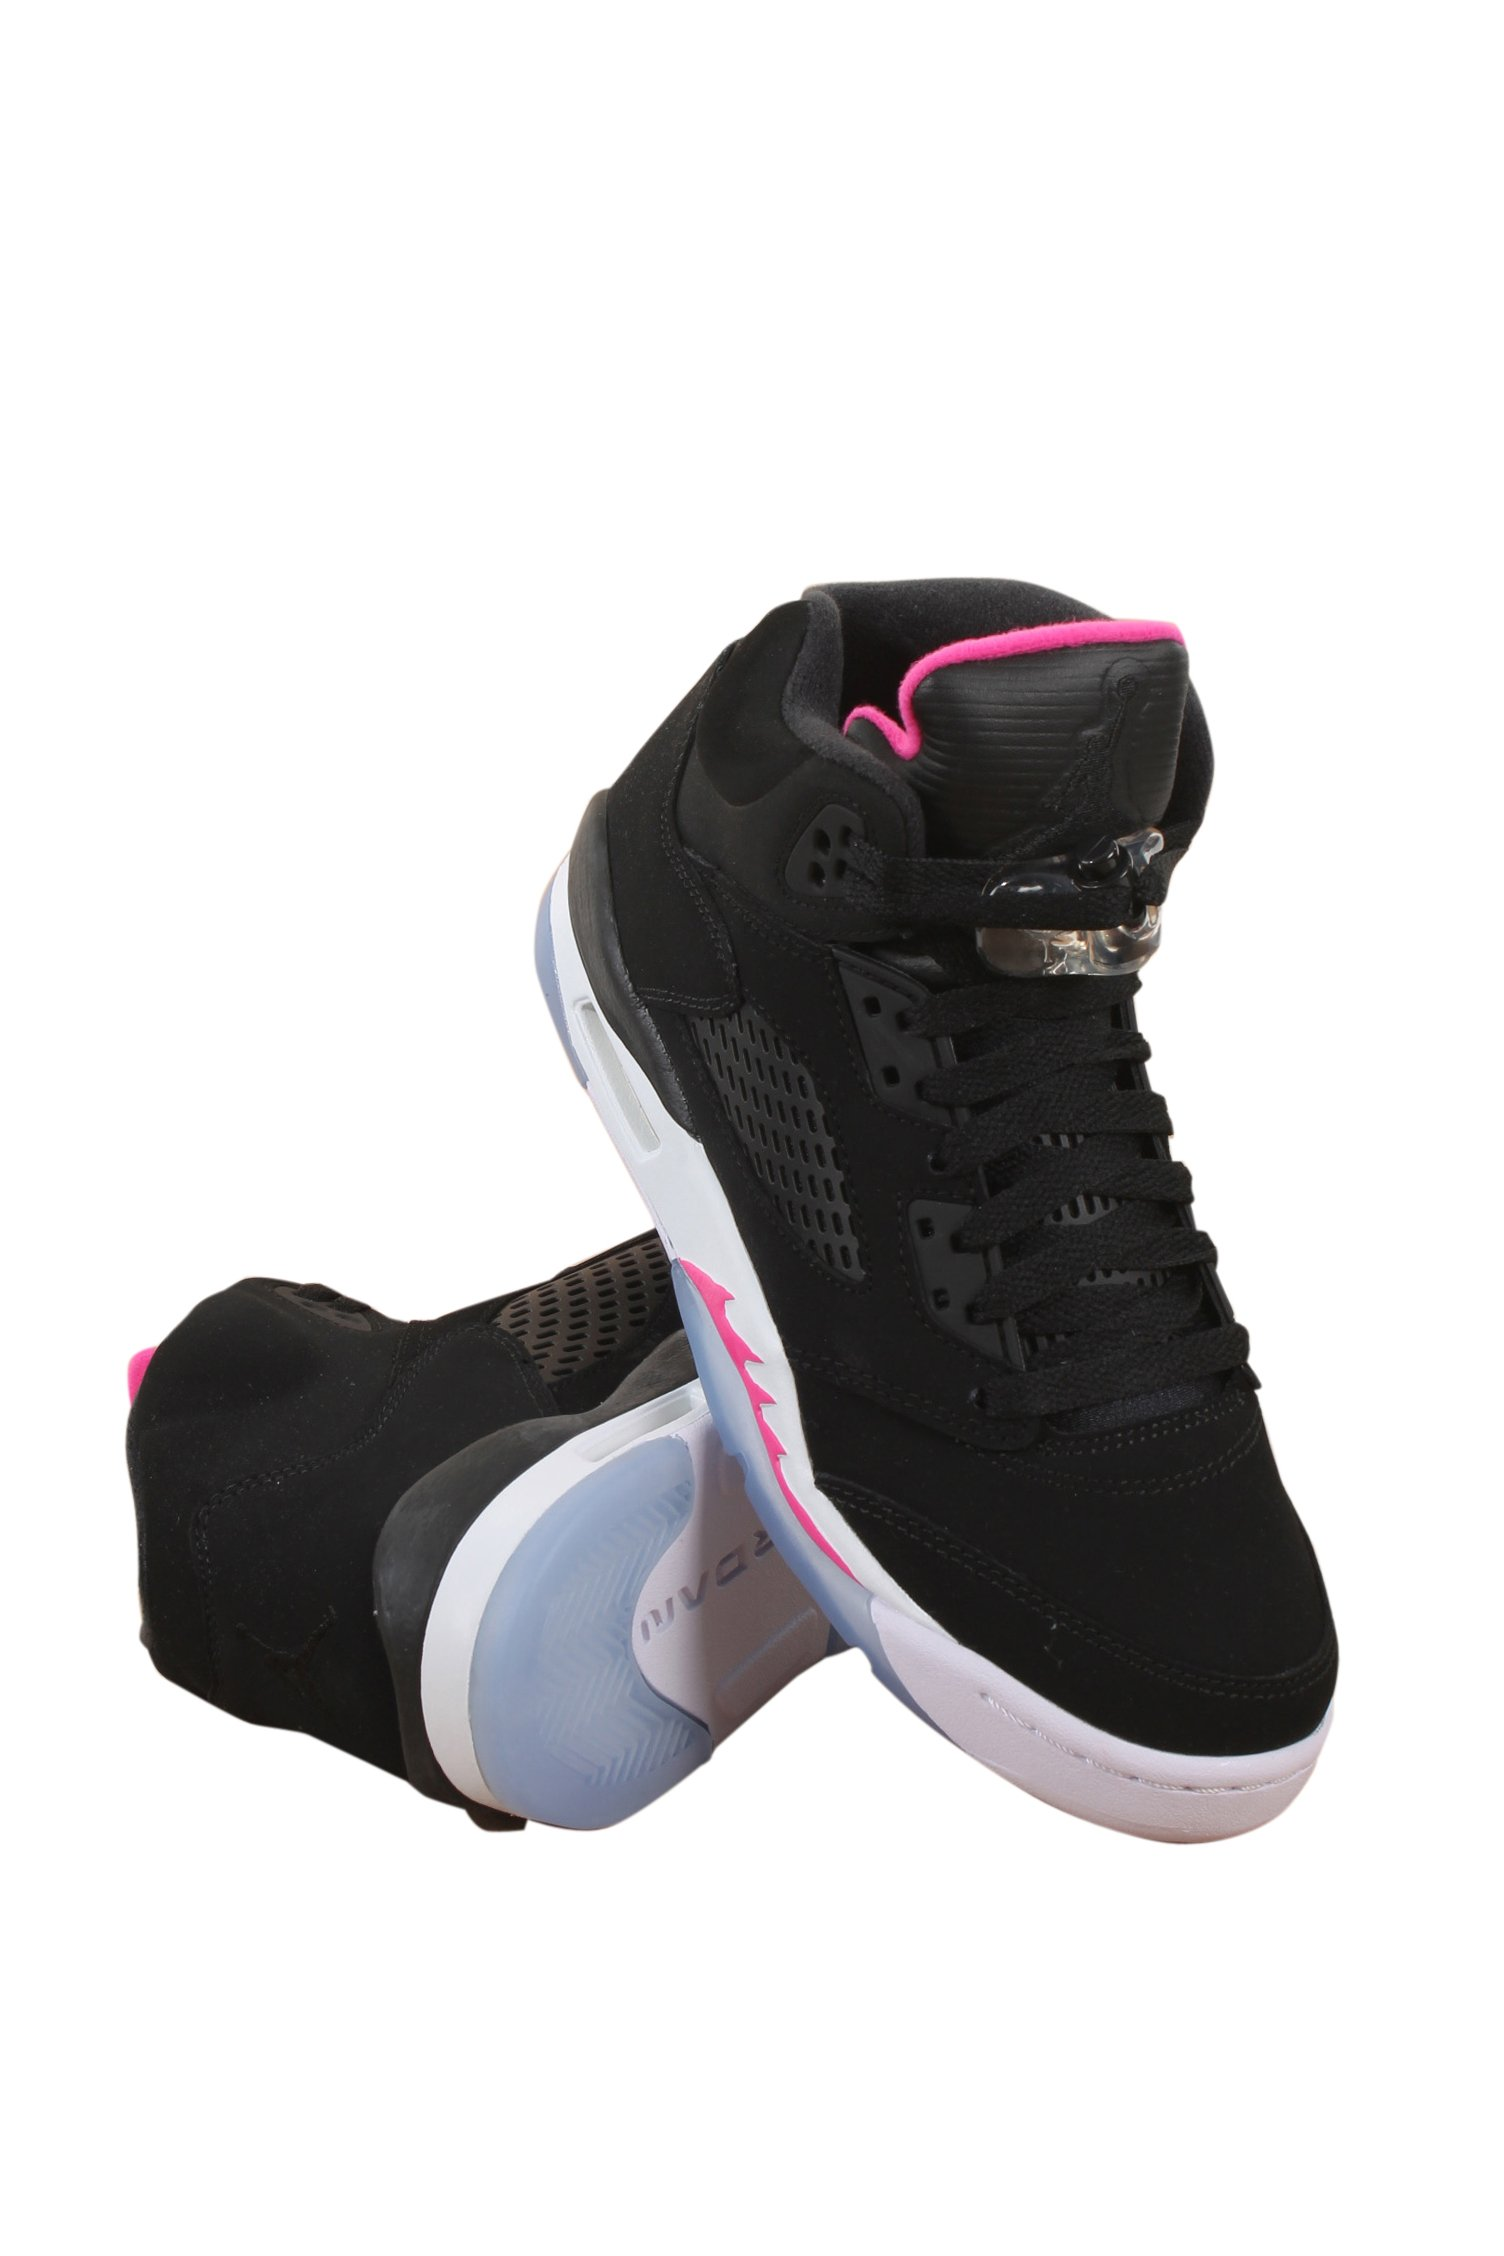 Jordan AIR 5 RETRO GG GIRL GRADE SCHL girls basketball-shoes 440892-029_7.5Y - BLACK/BLACK-DEADLY PINK-WHITE by Jordan